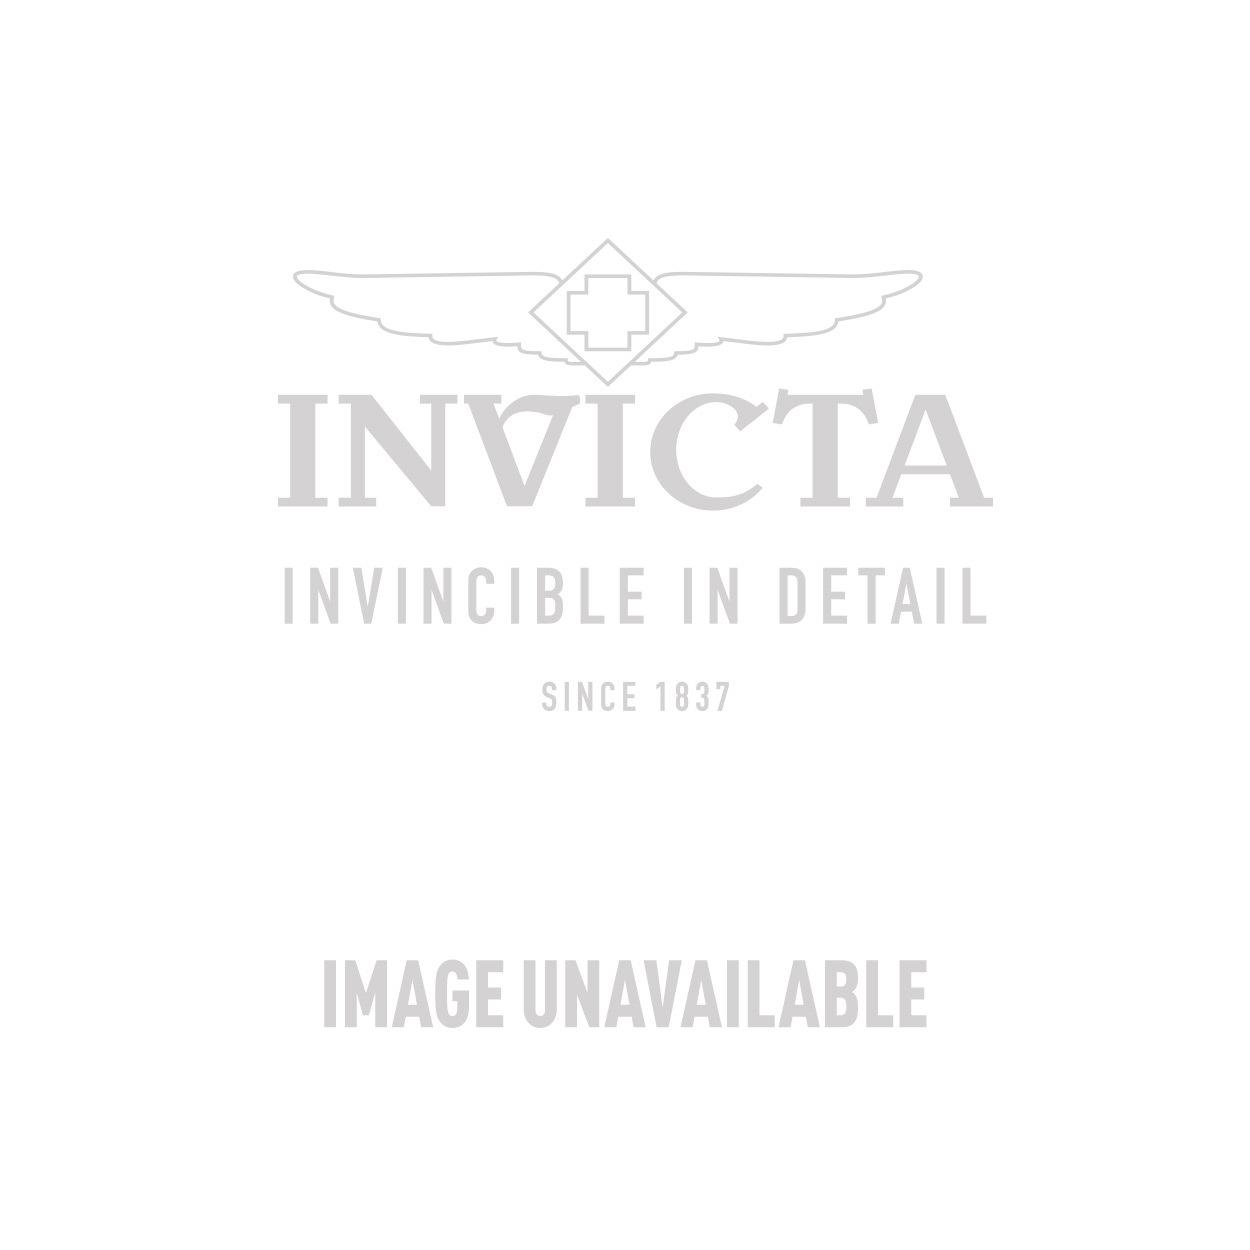 INVICTA Jewelry ALOYSIUS Rings None 14 Silver 925 and Ceramic Rhodium+White+Platinum - Model J0119